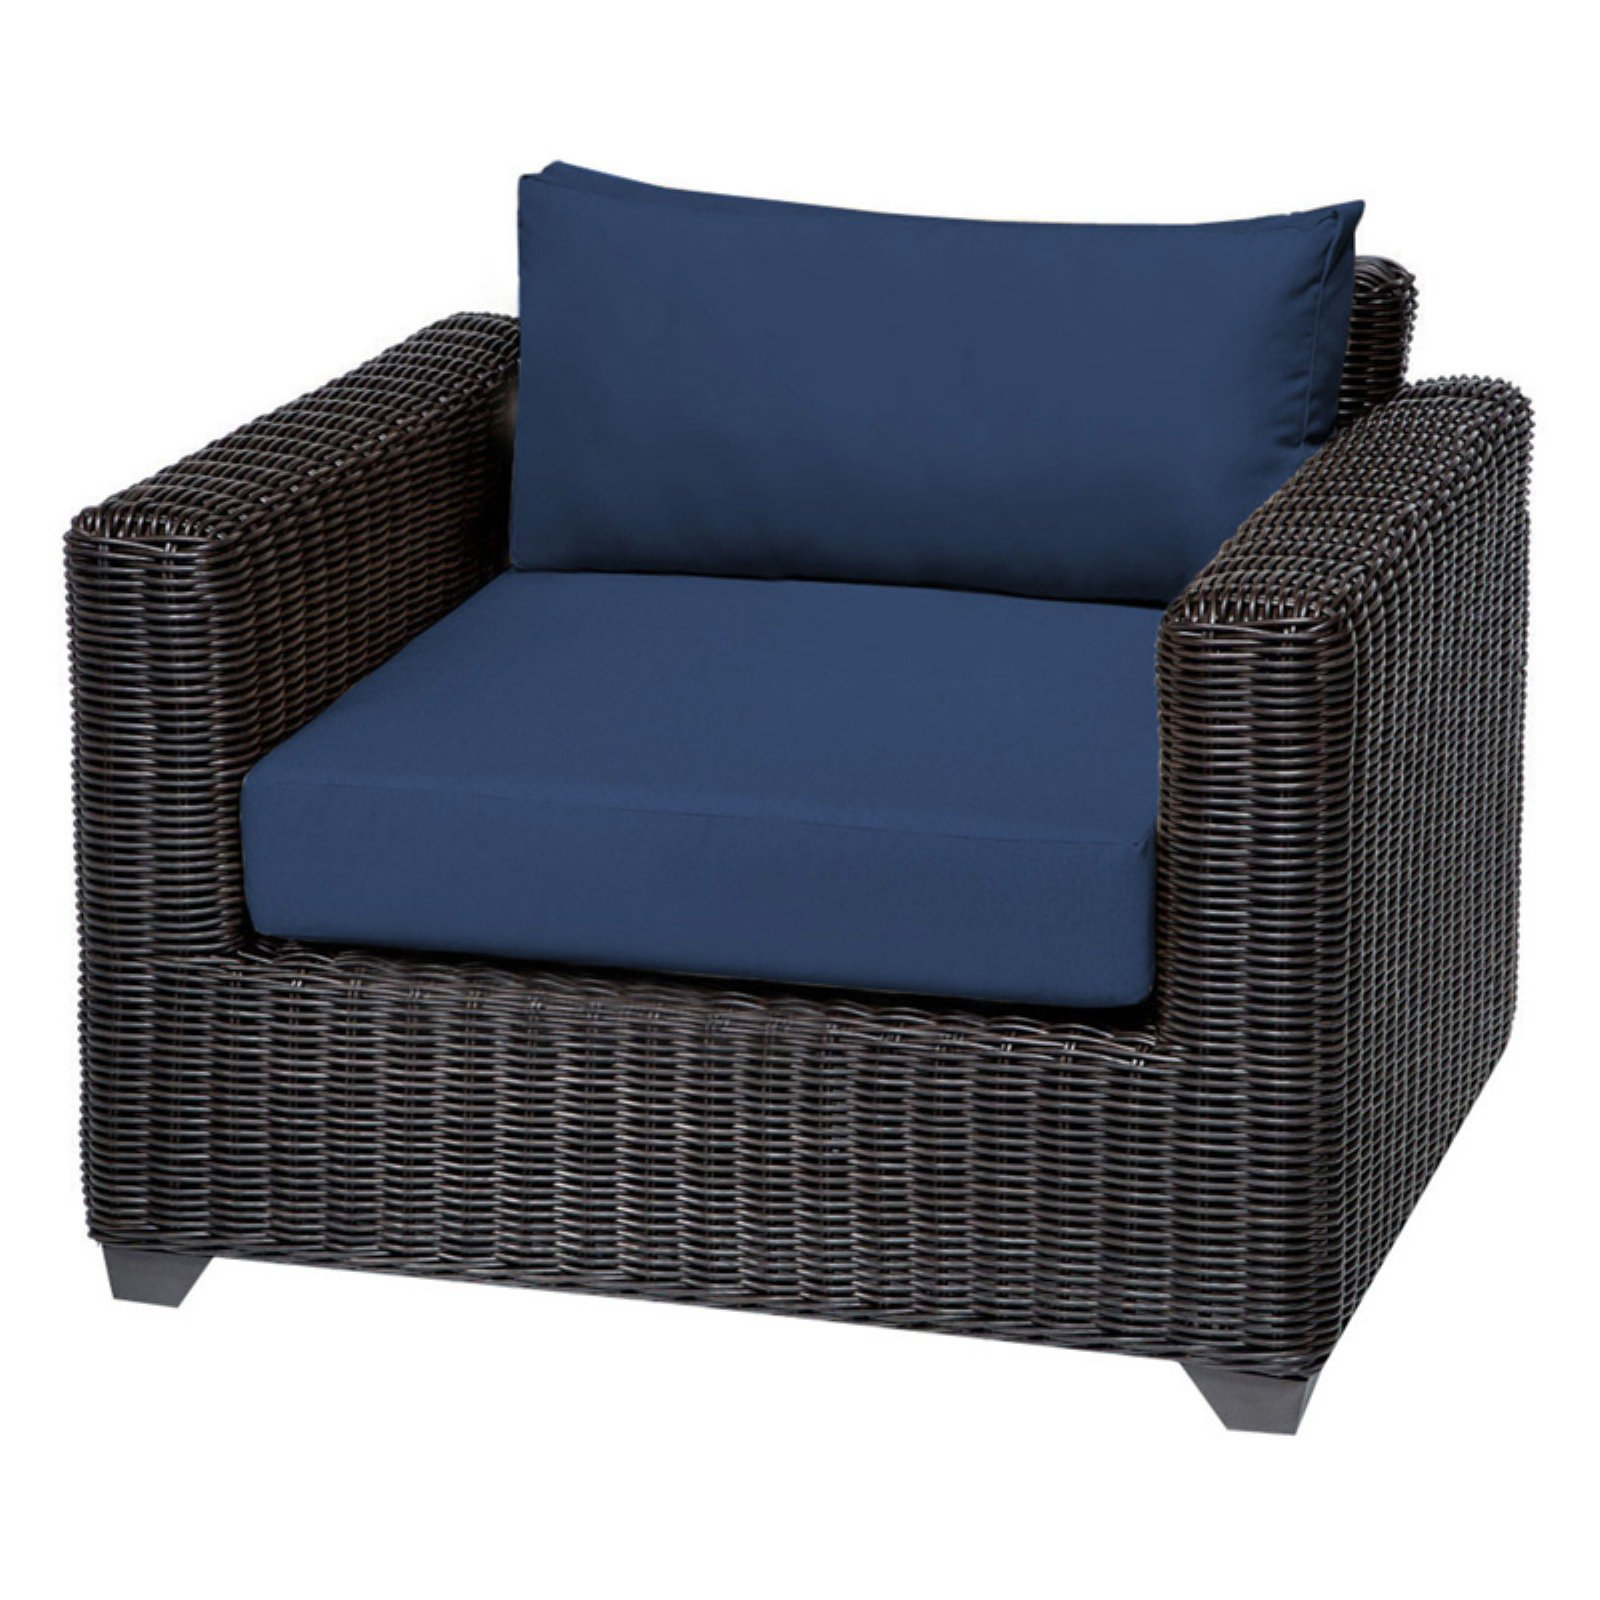 TK Classics Venice Wicker Outdoor Club Chair